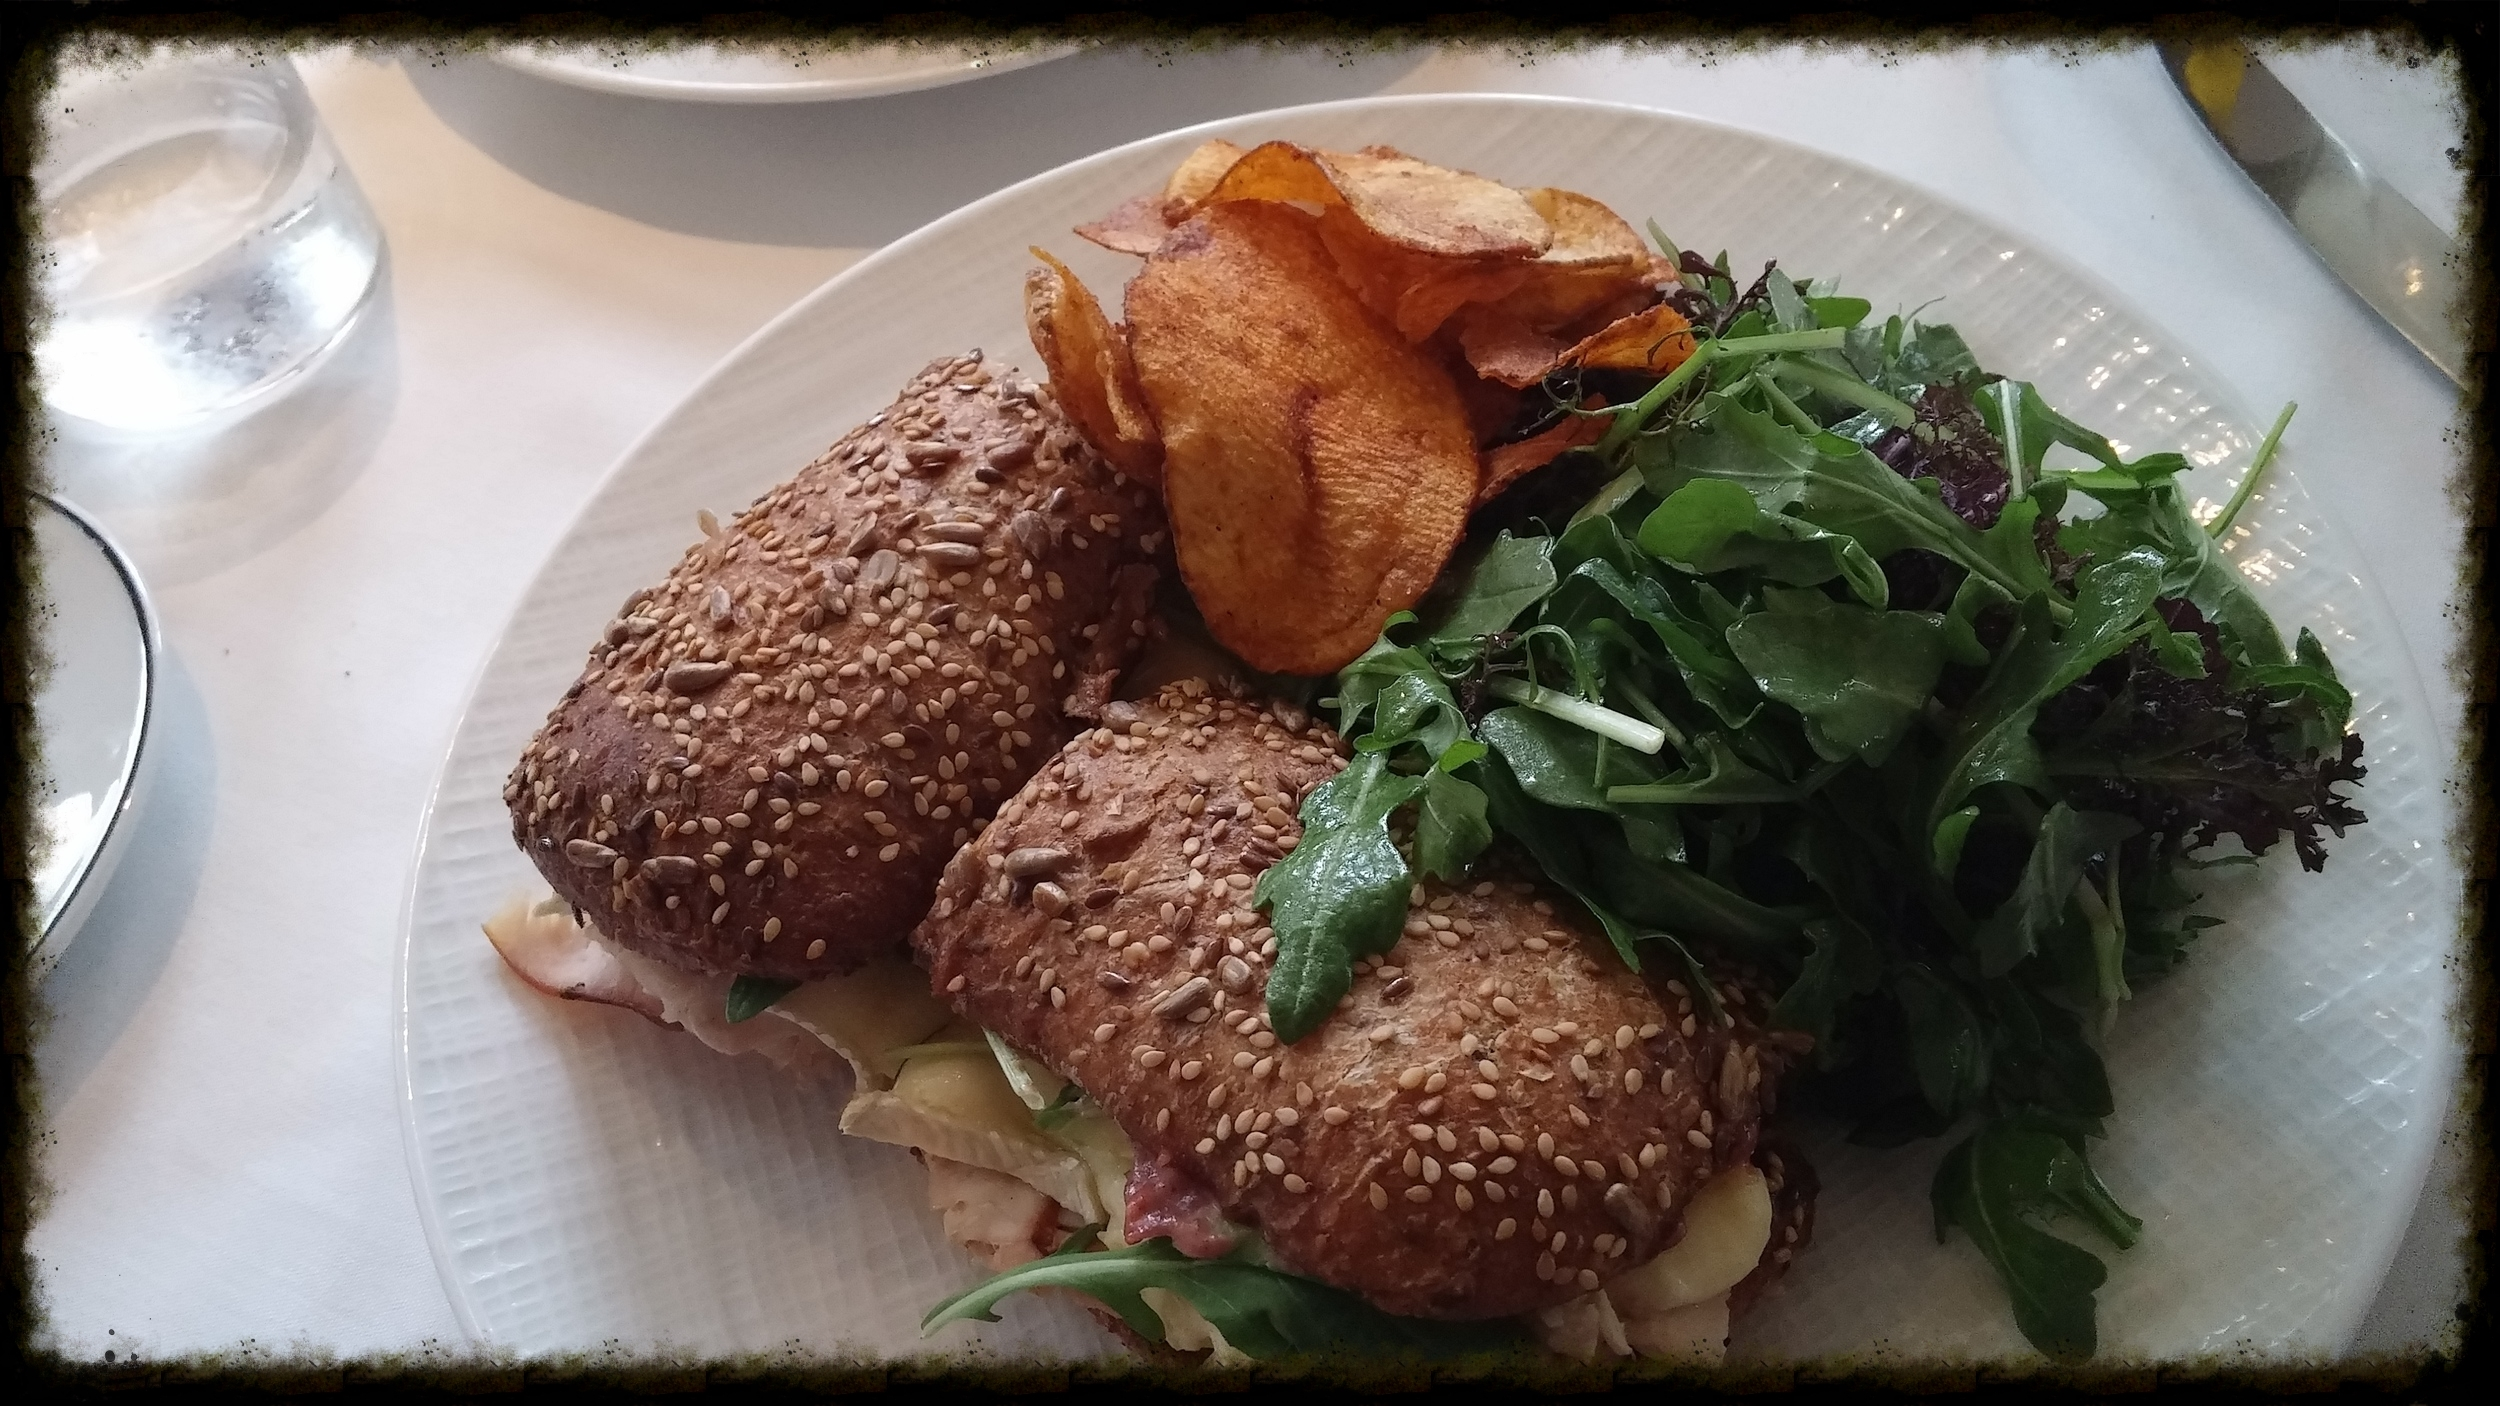 House-Smoked Turkey Breast Sandwich